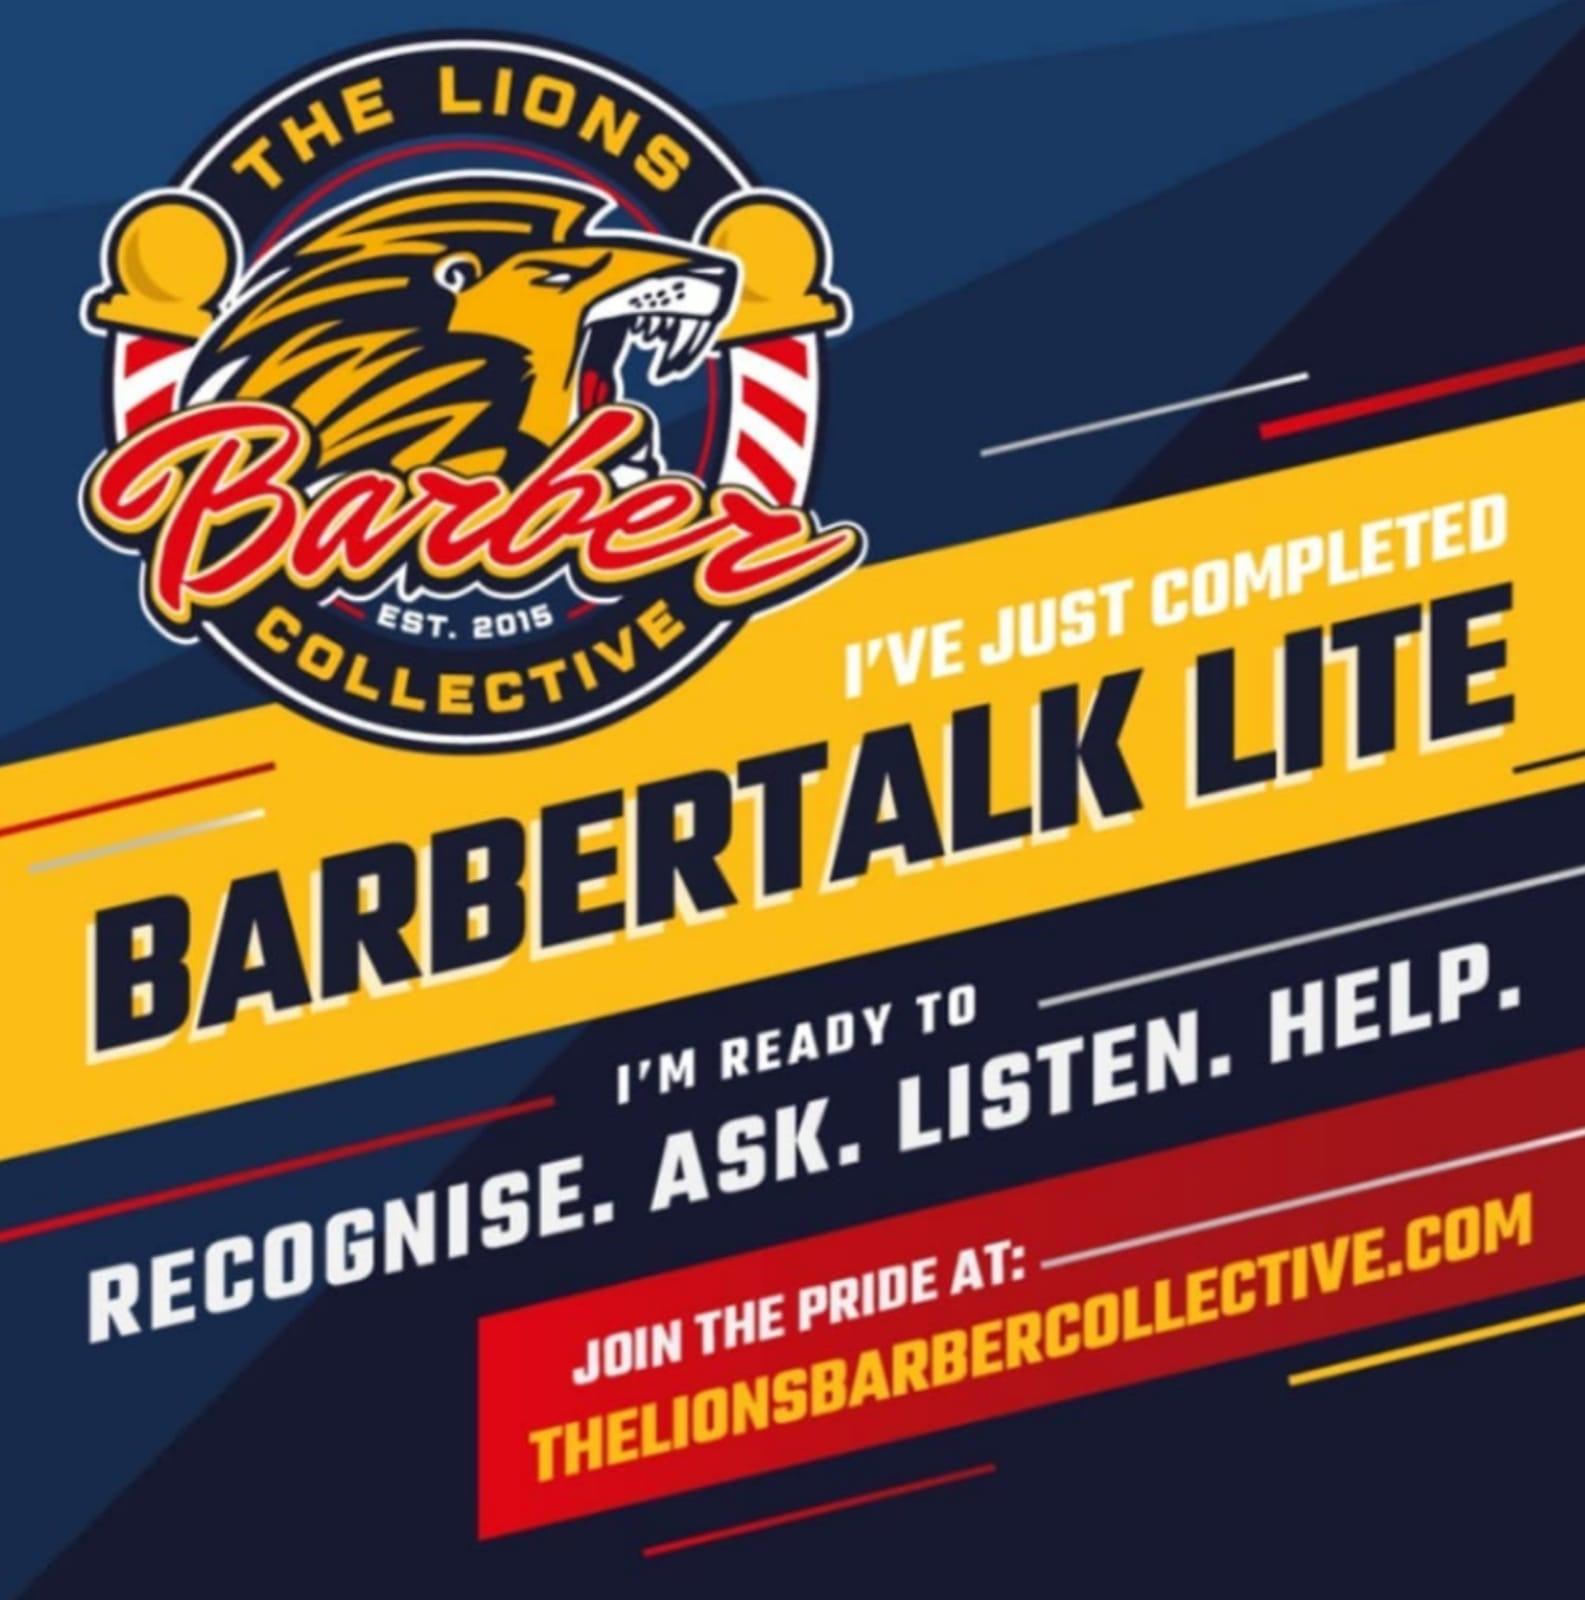 Barber Talk lite